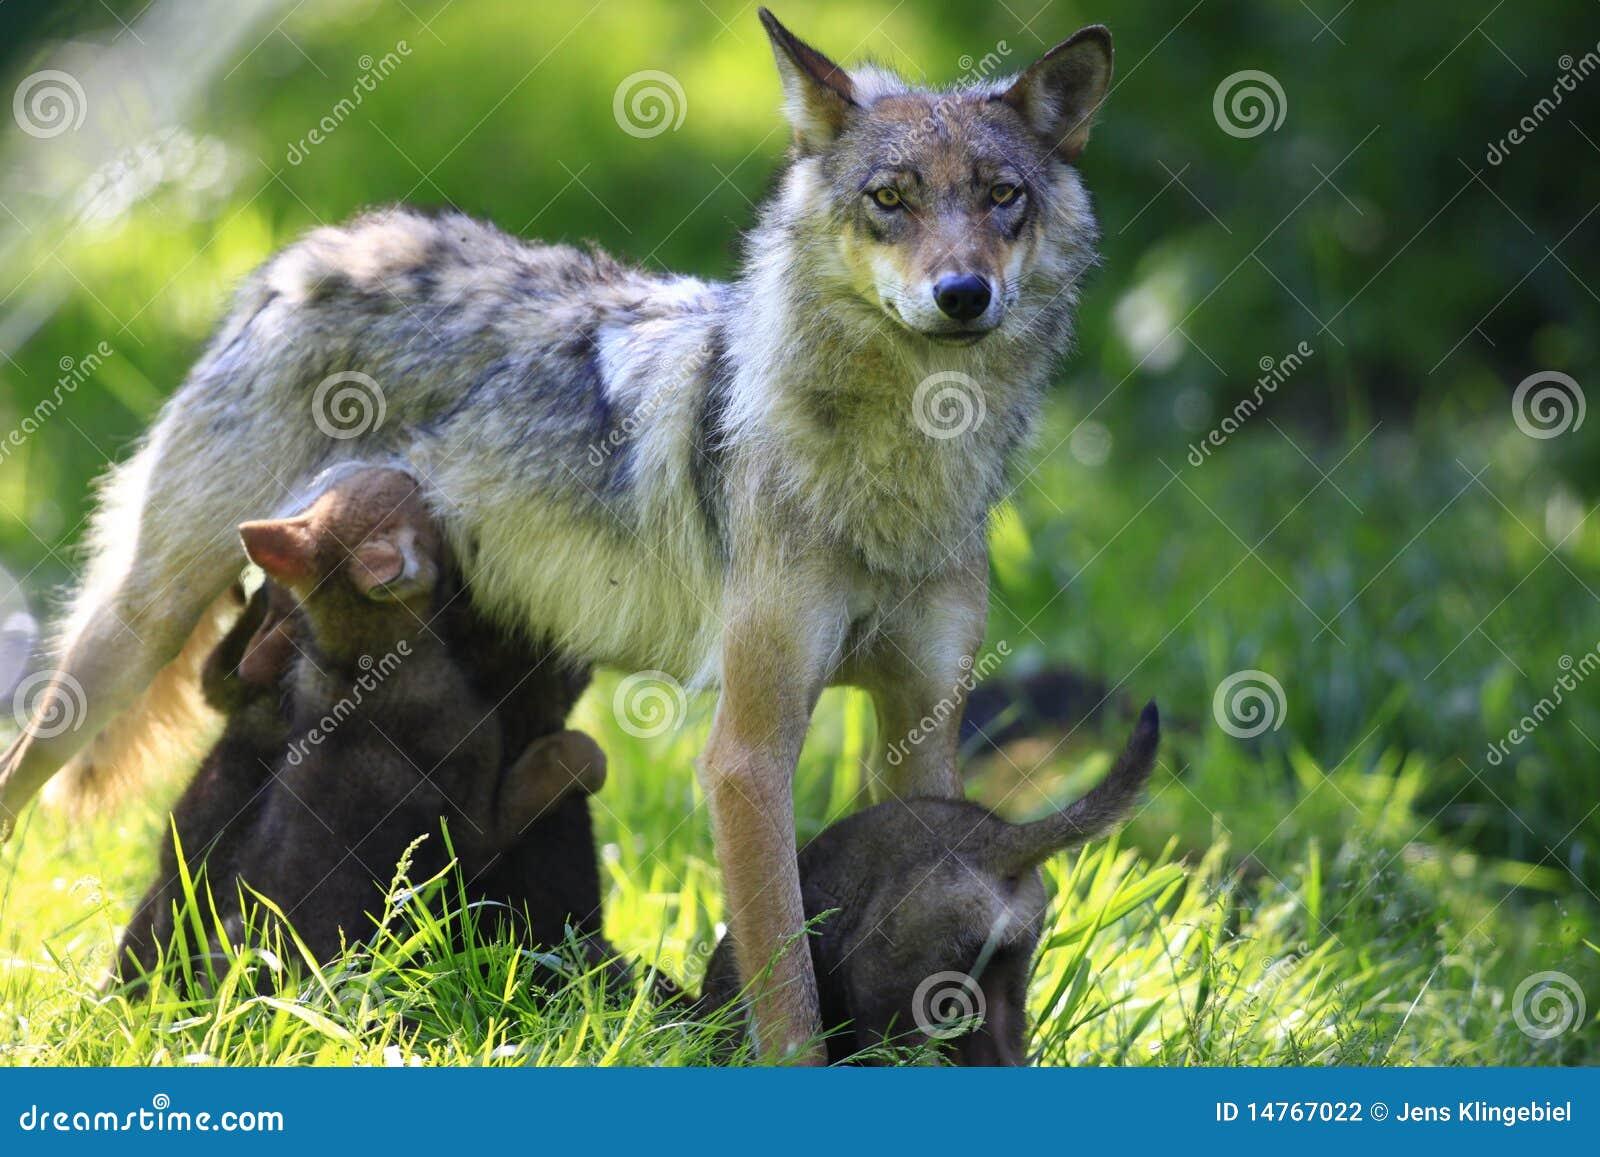 wolf stock photo  image of wild  animal  forest  wildlife